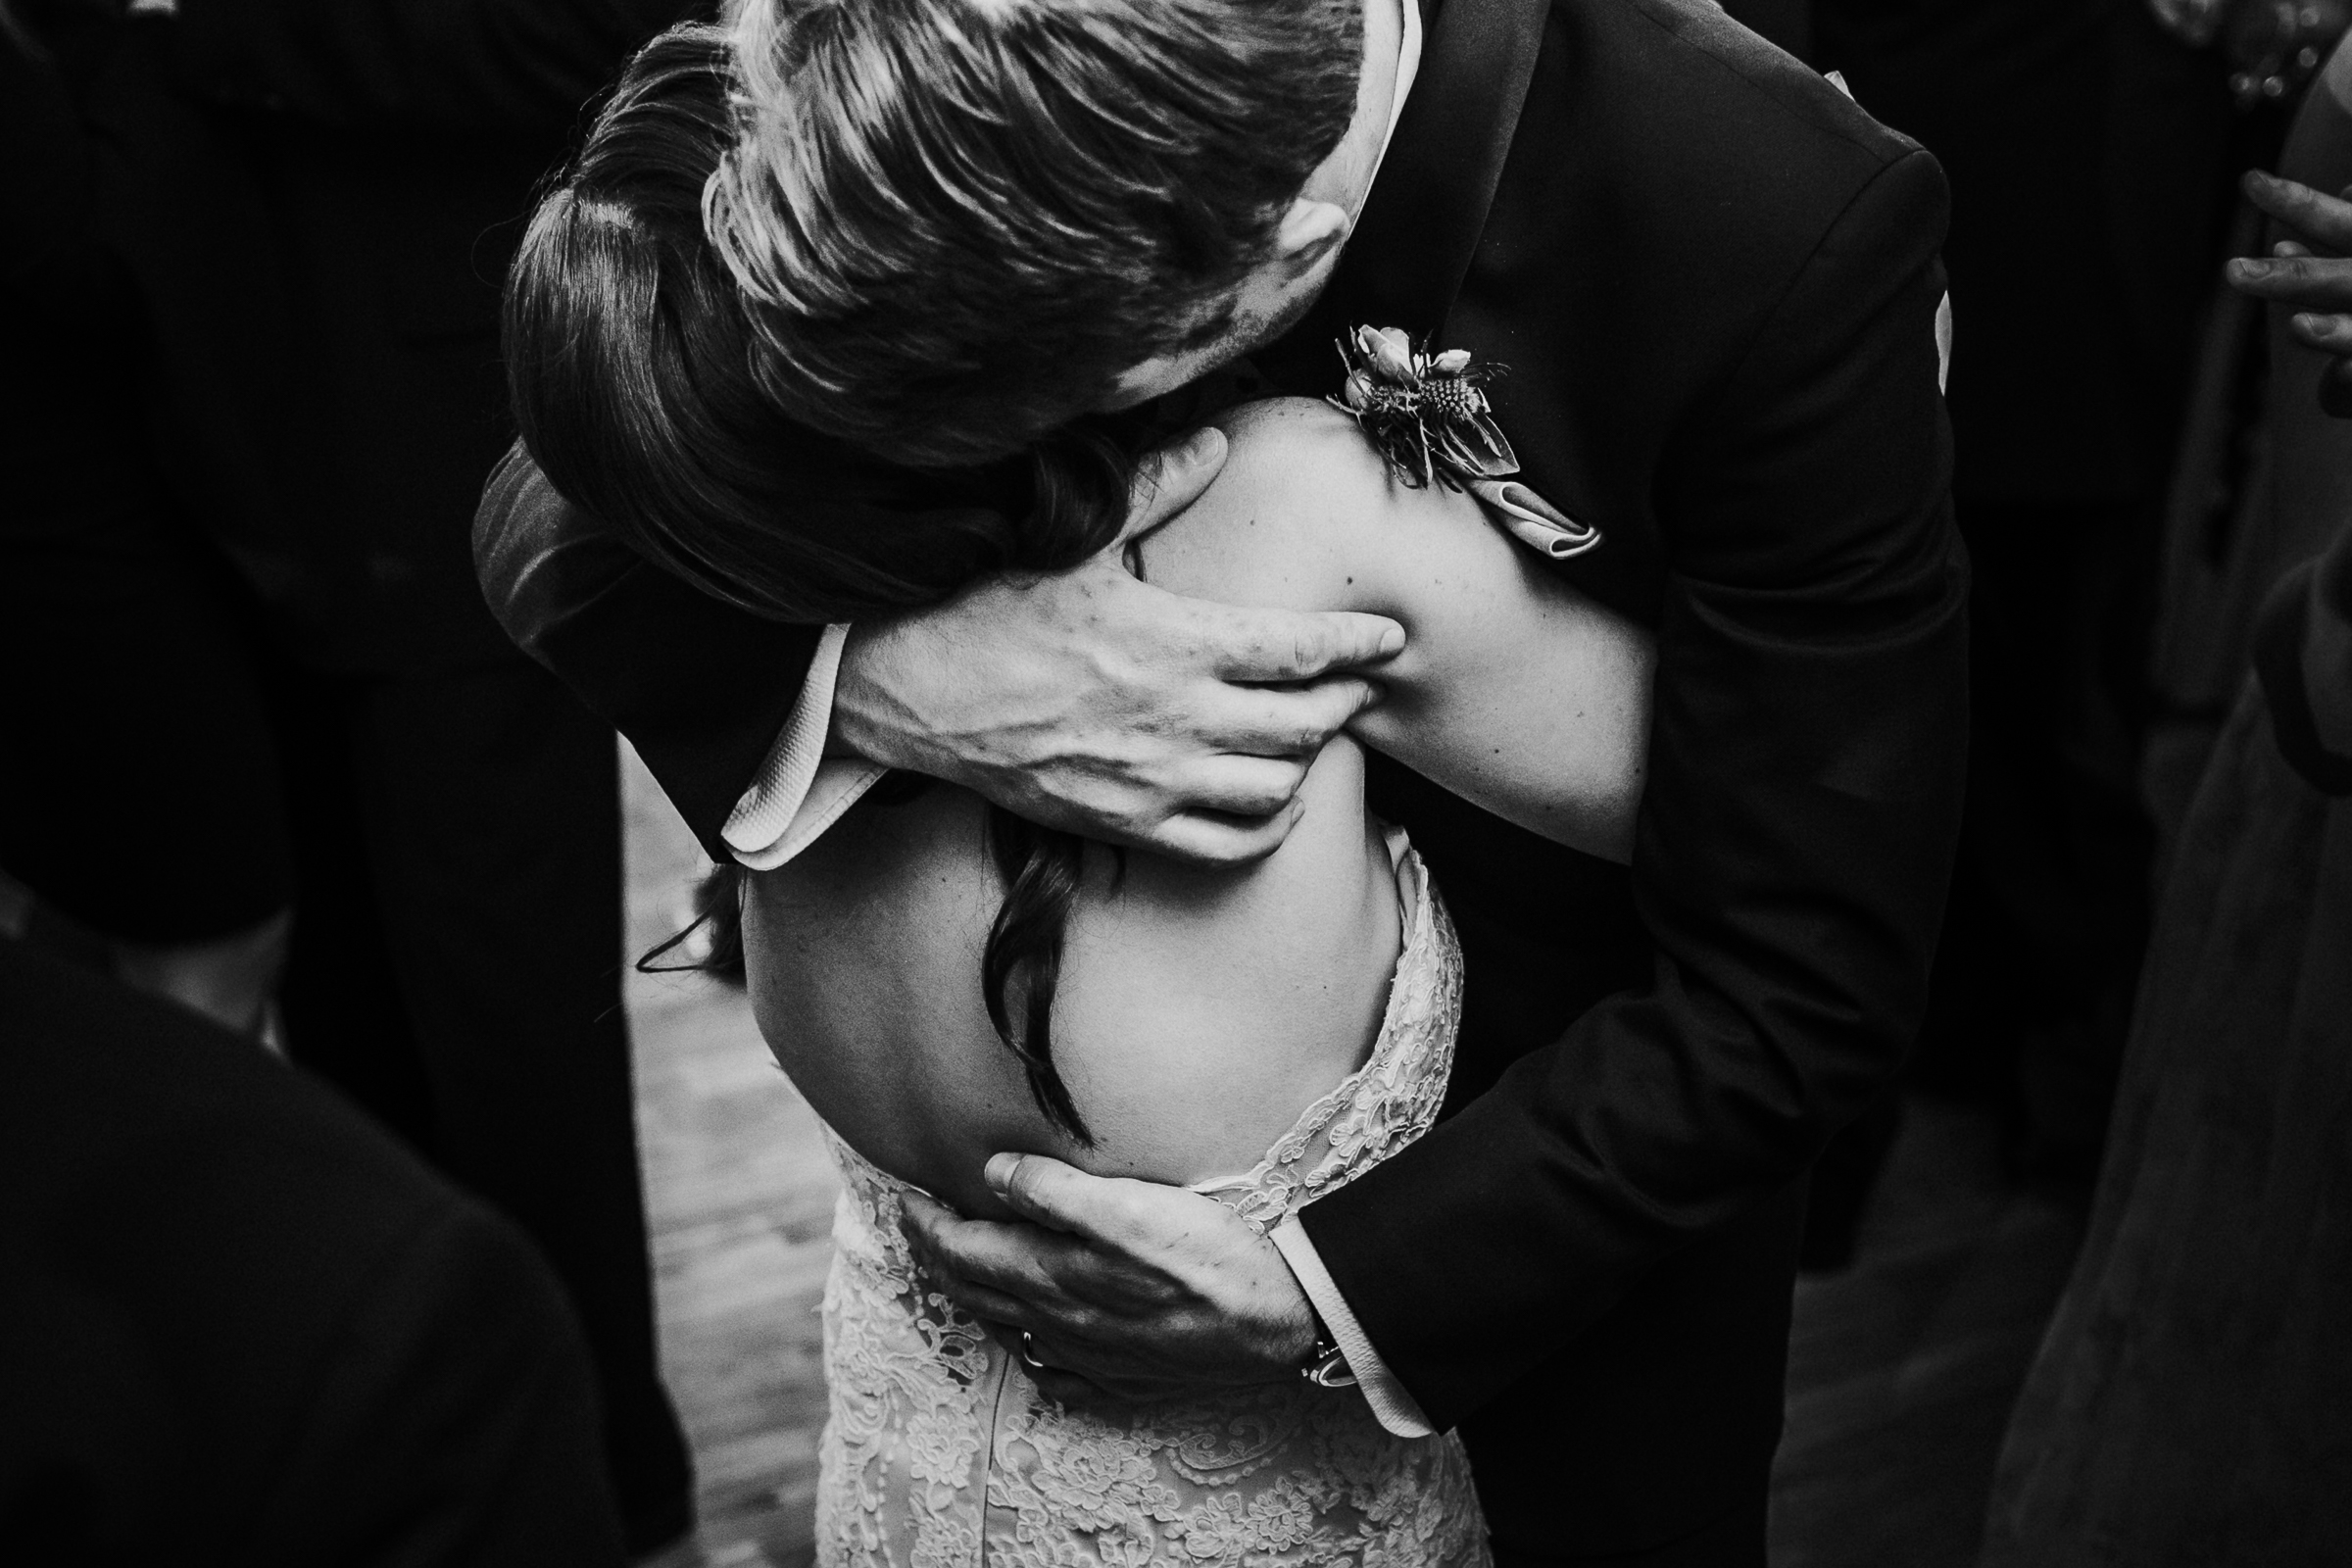 New-York-Documentary-Wedding-Photography-Best-Of-2017-by-Elvira-Kalviste-Photography-21.jpg